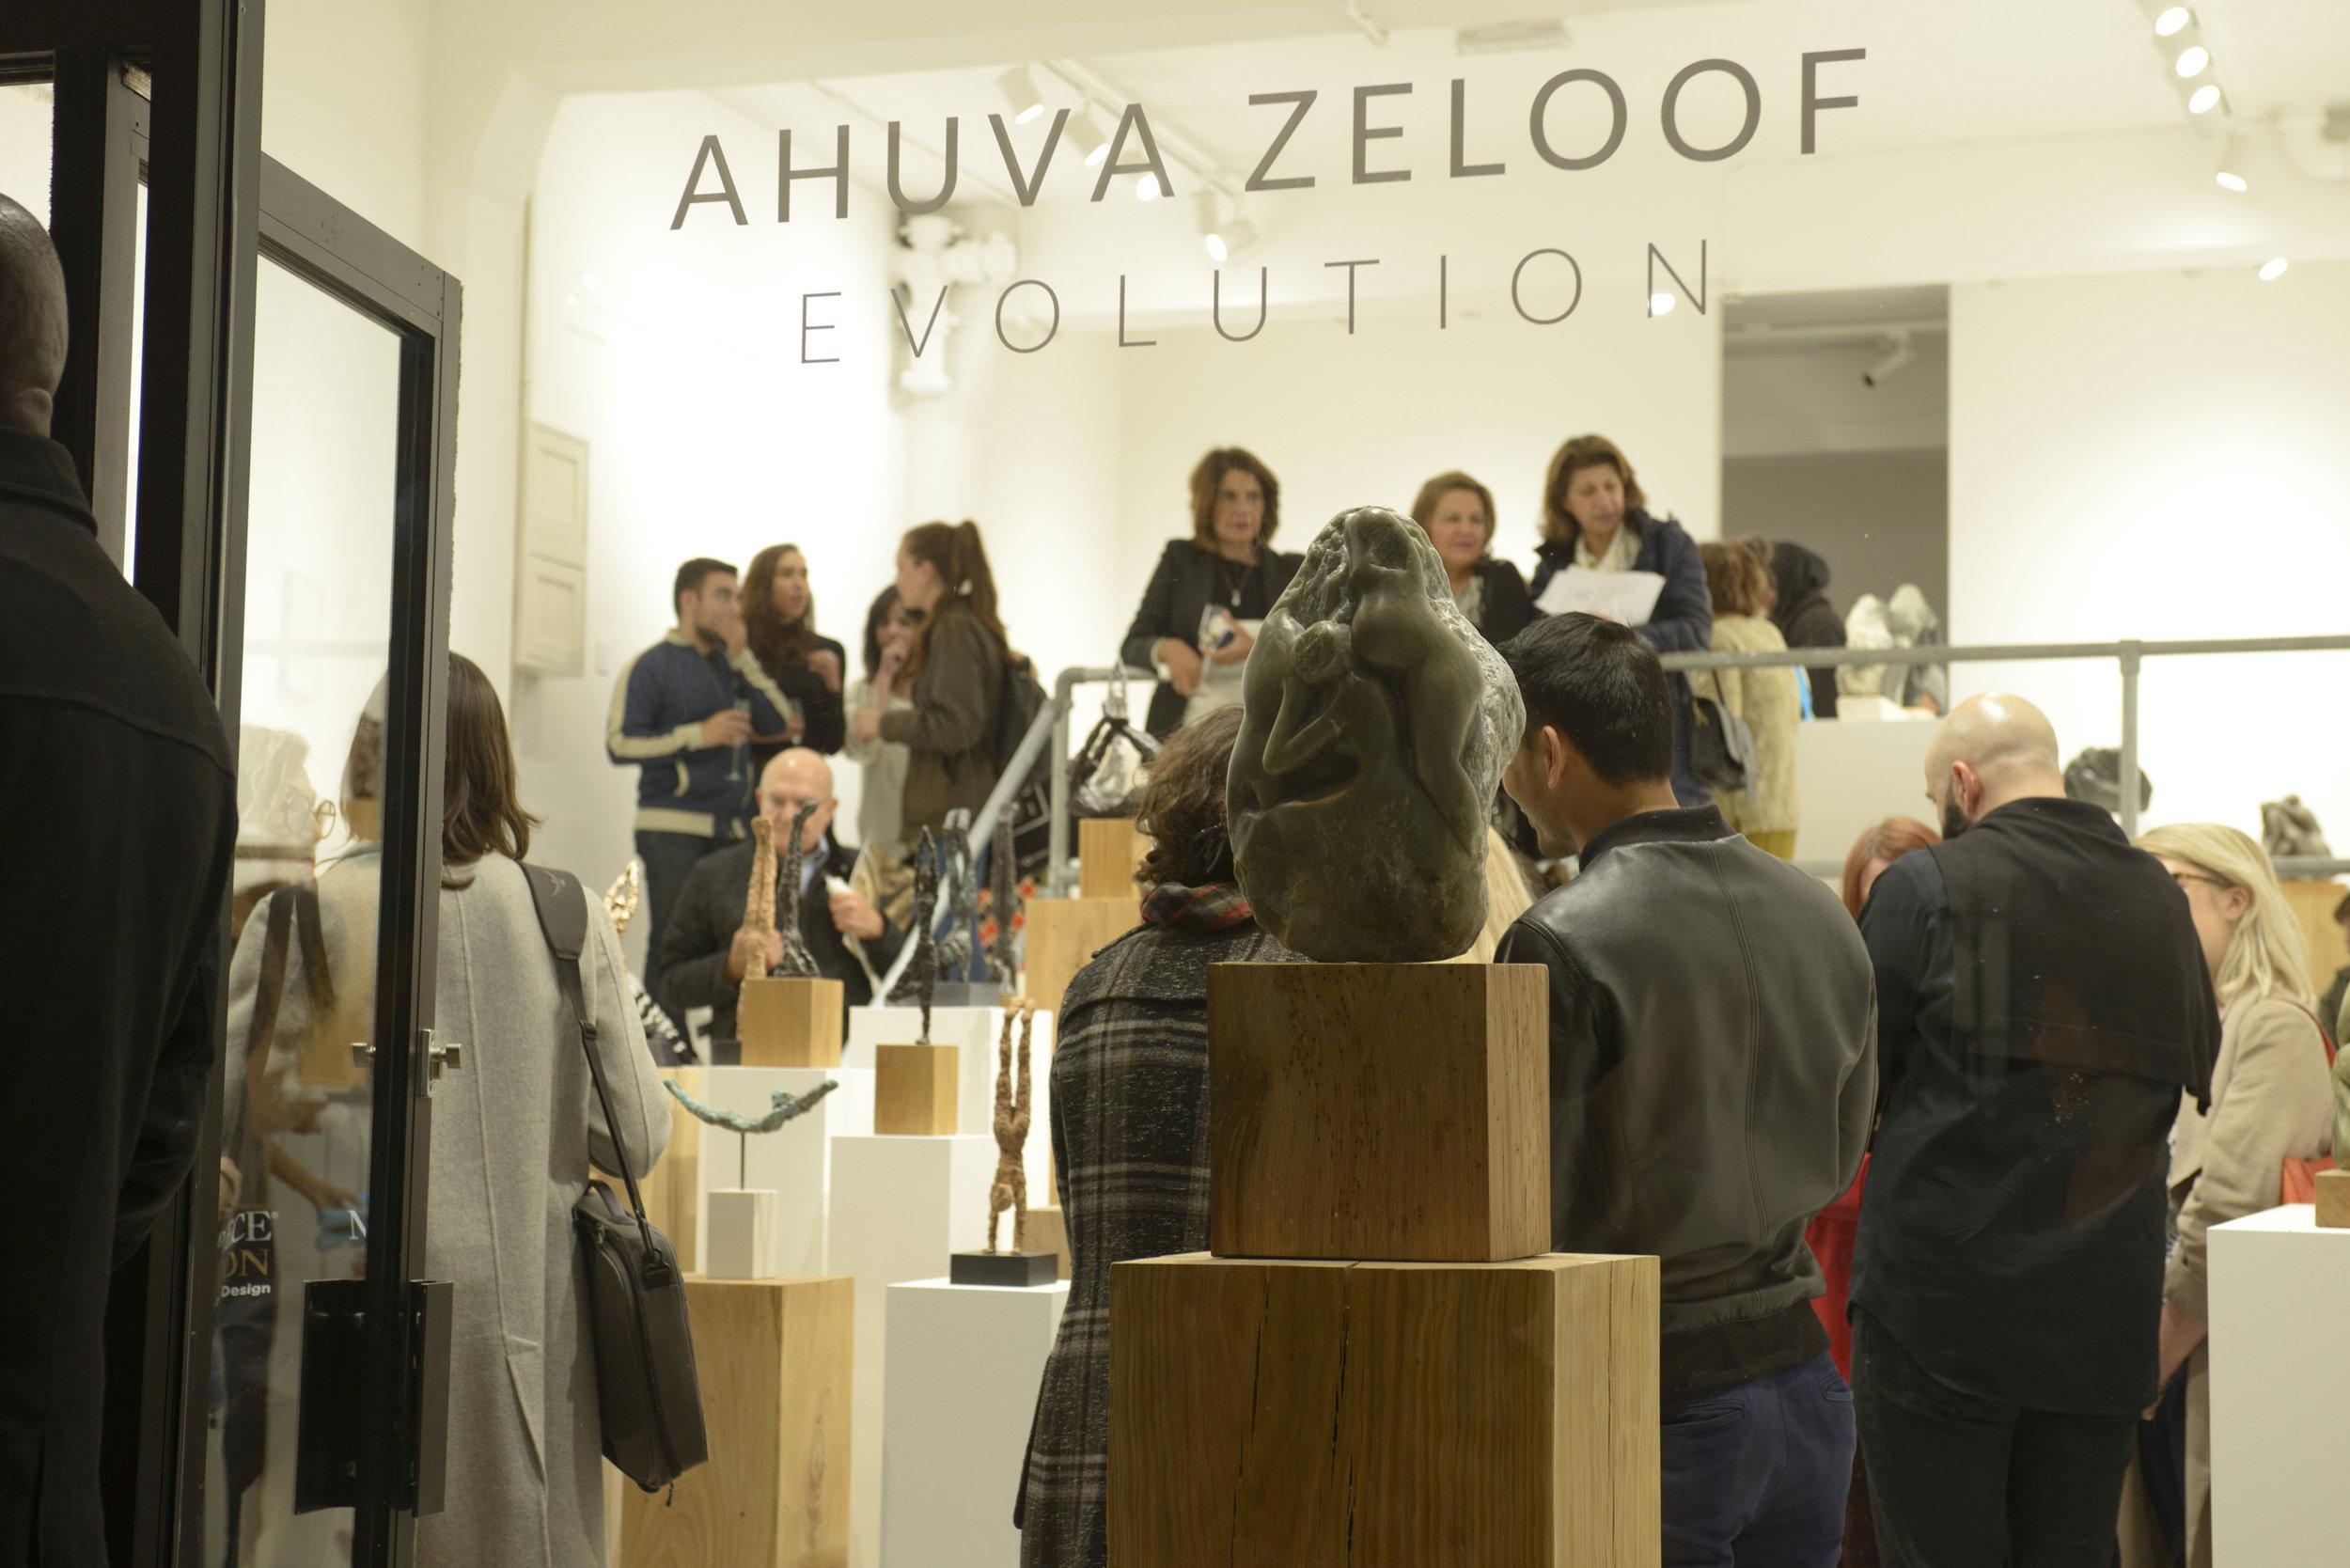 AHUVA_2203.jpg